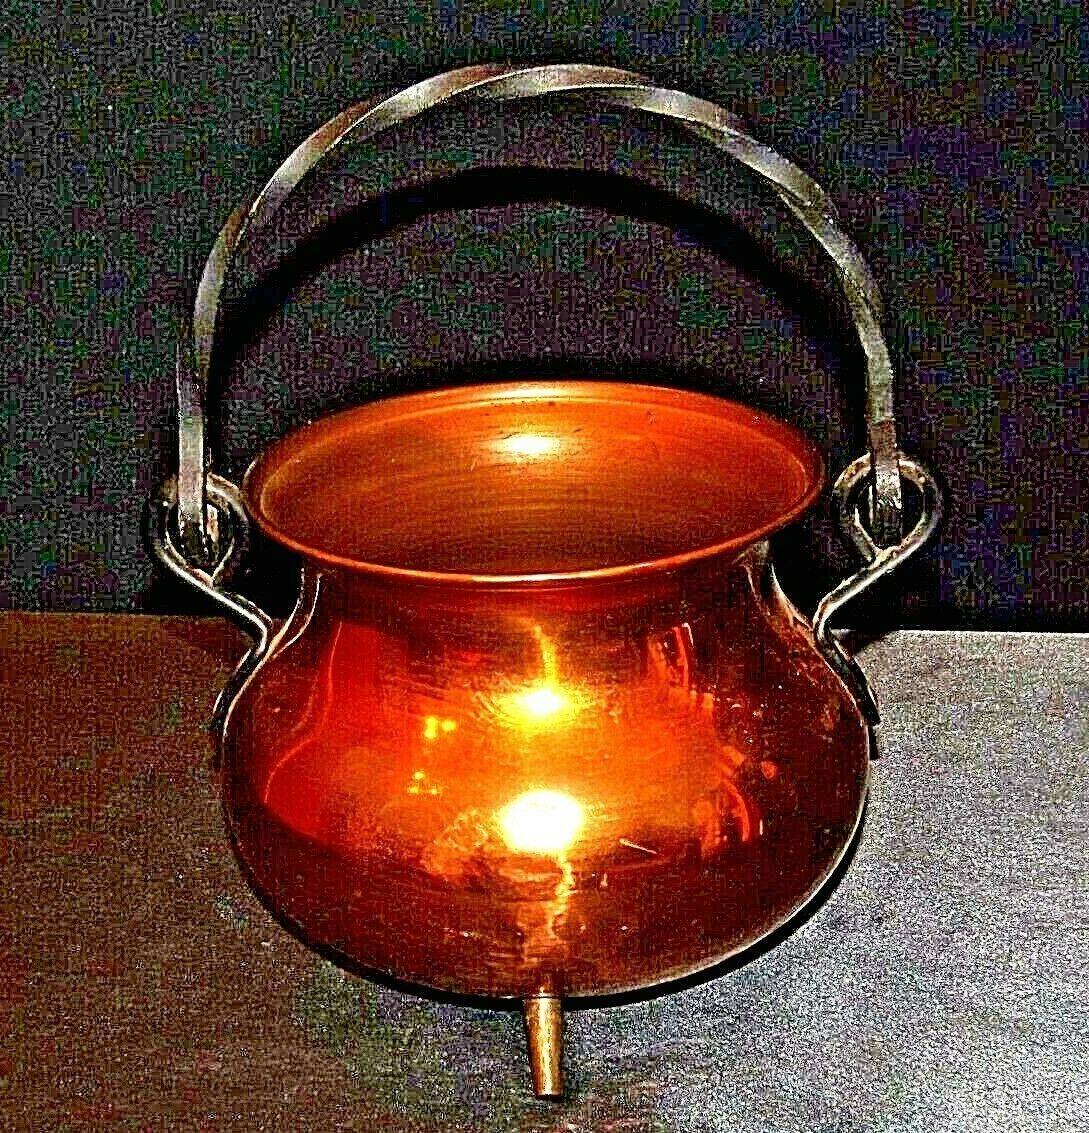 Copper Cauldron Cauldron with Metal Handle RIO TIEL AA19-1505 Antique